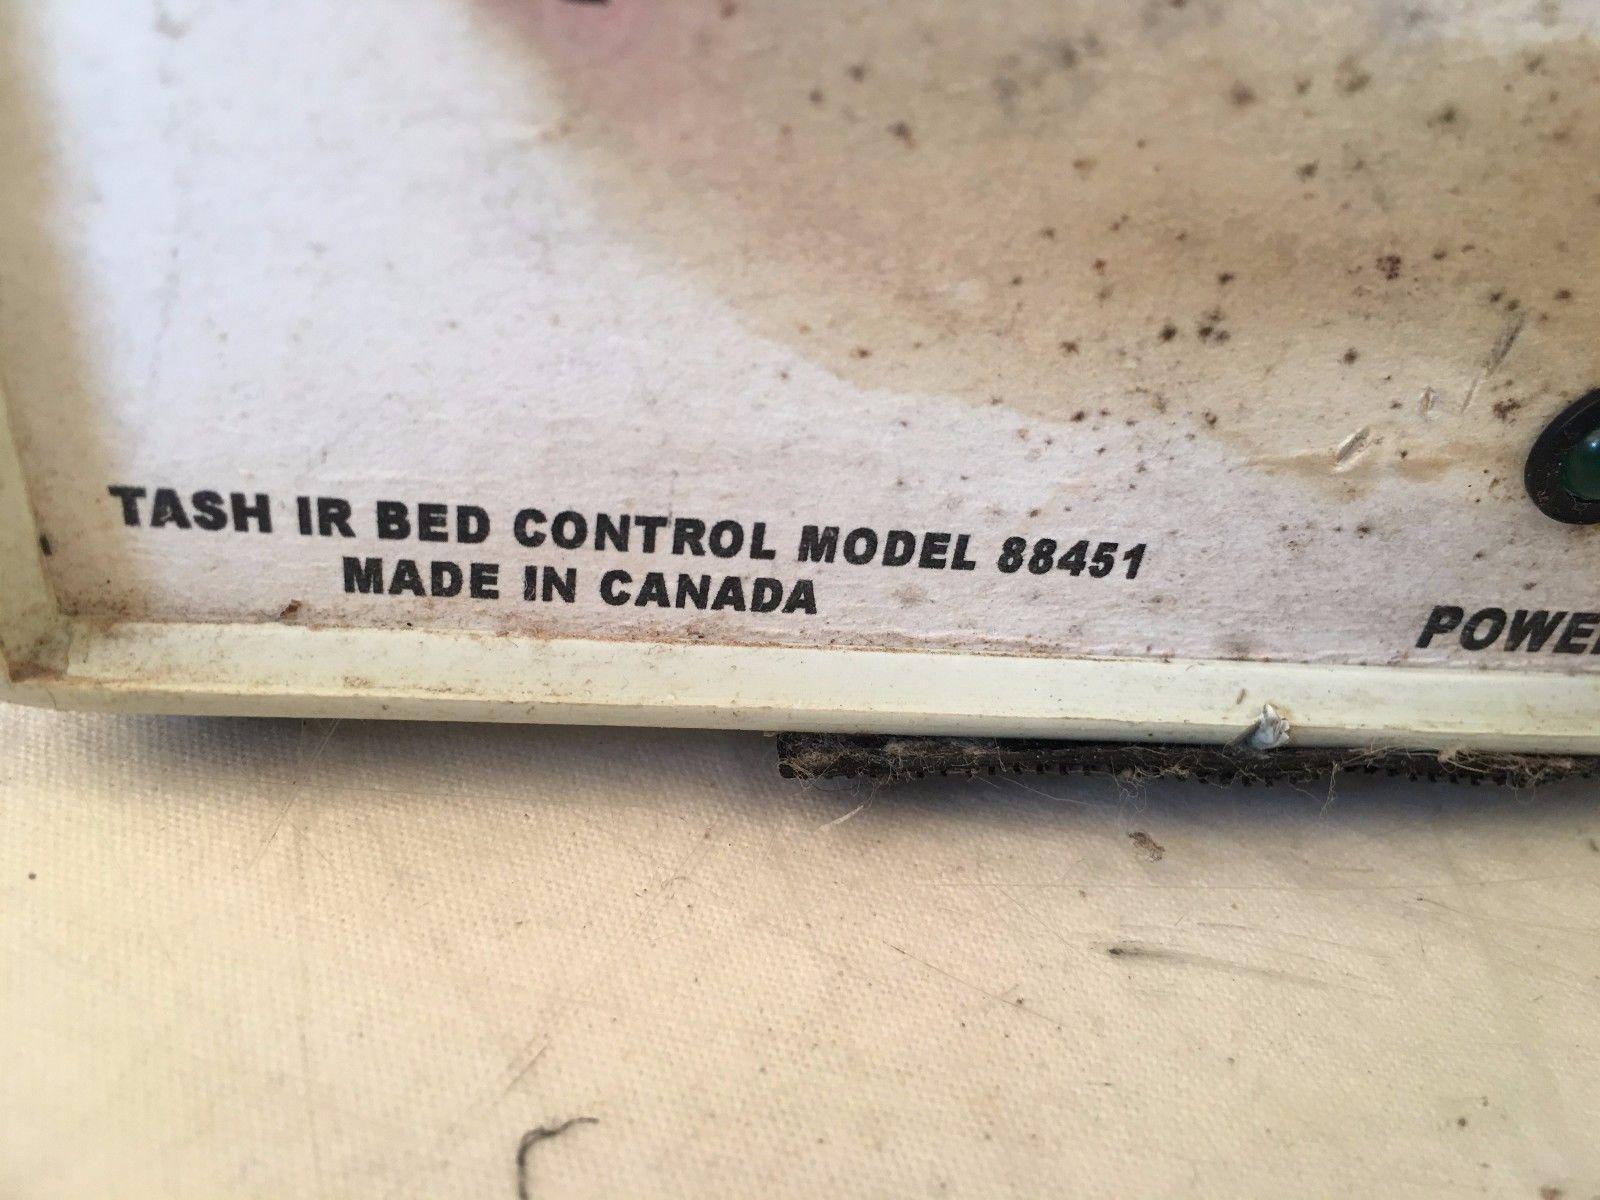 Tash IR Bed Control Model 88451